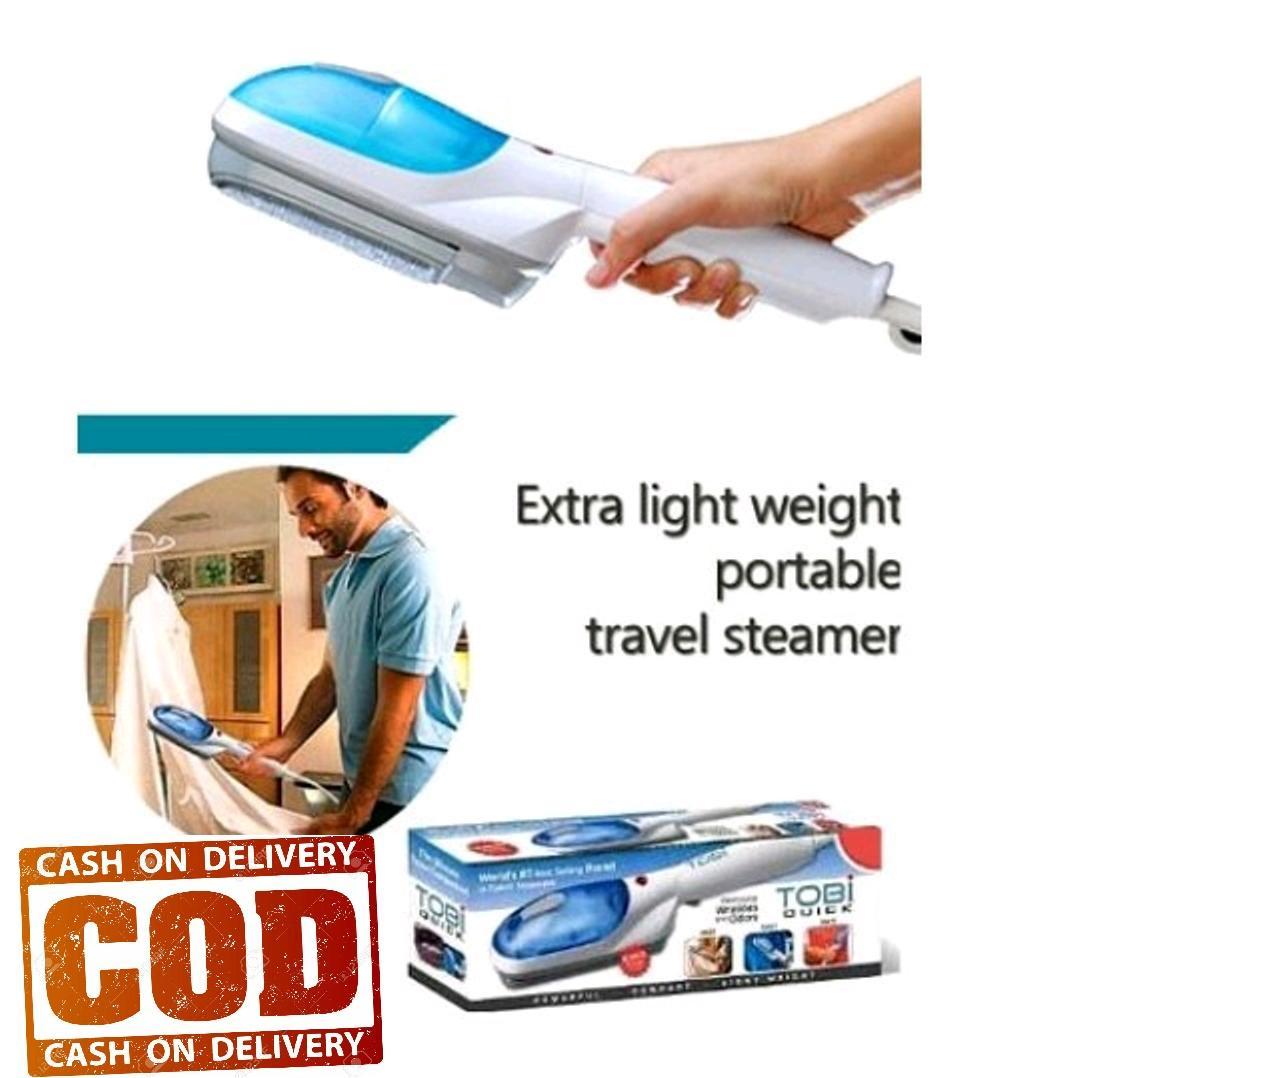 Setrika Gosokan Uap Travel Genggam Steam Wand Hand Ironing dengan Spray Air Seperti di TV Biru